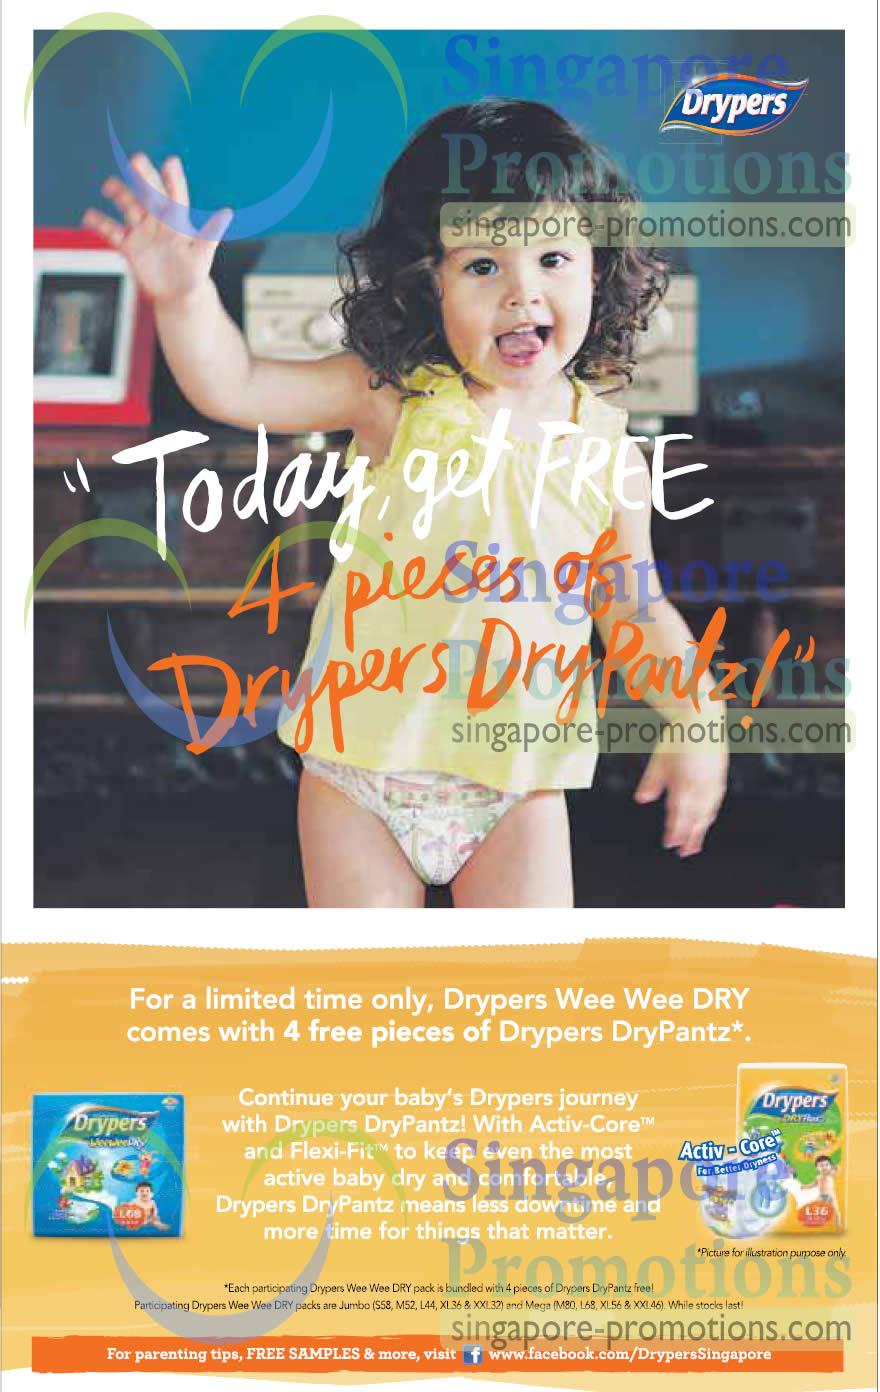 Mini me love it! : merries baby diapers sample | singapore.